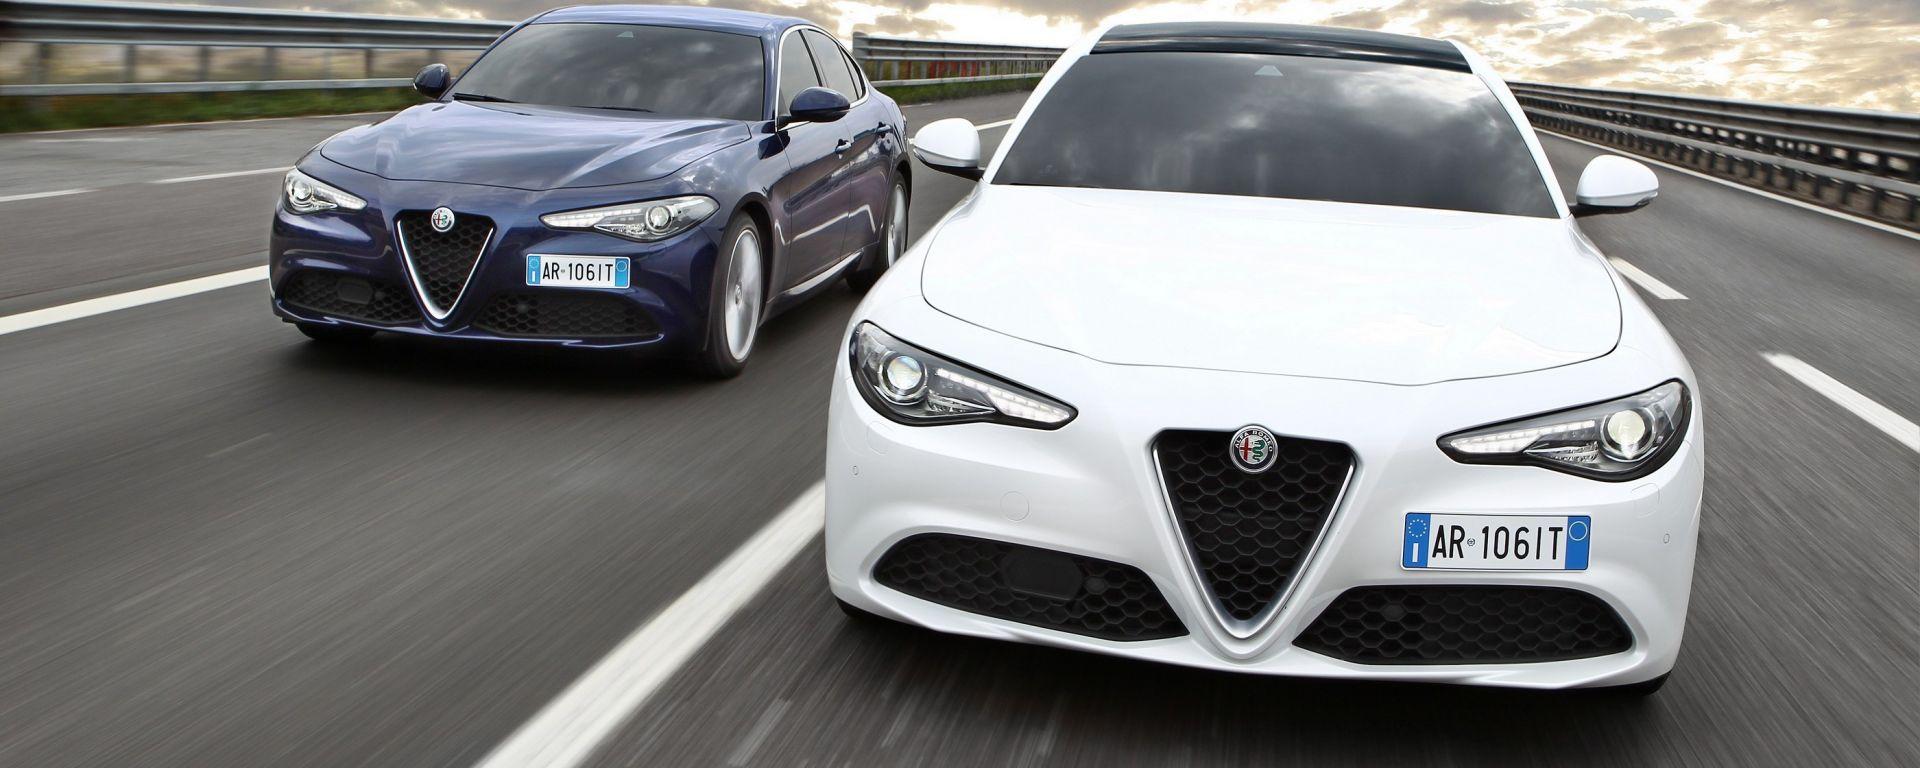 Alfa Romeo Giulia: 35mila visitatori al porte aperte dei record